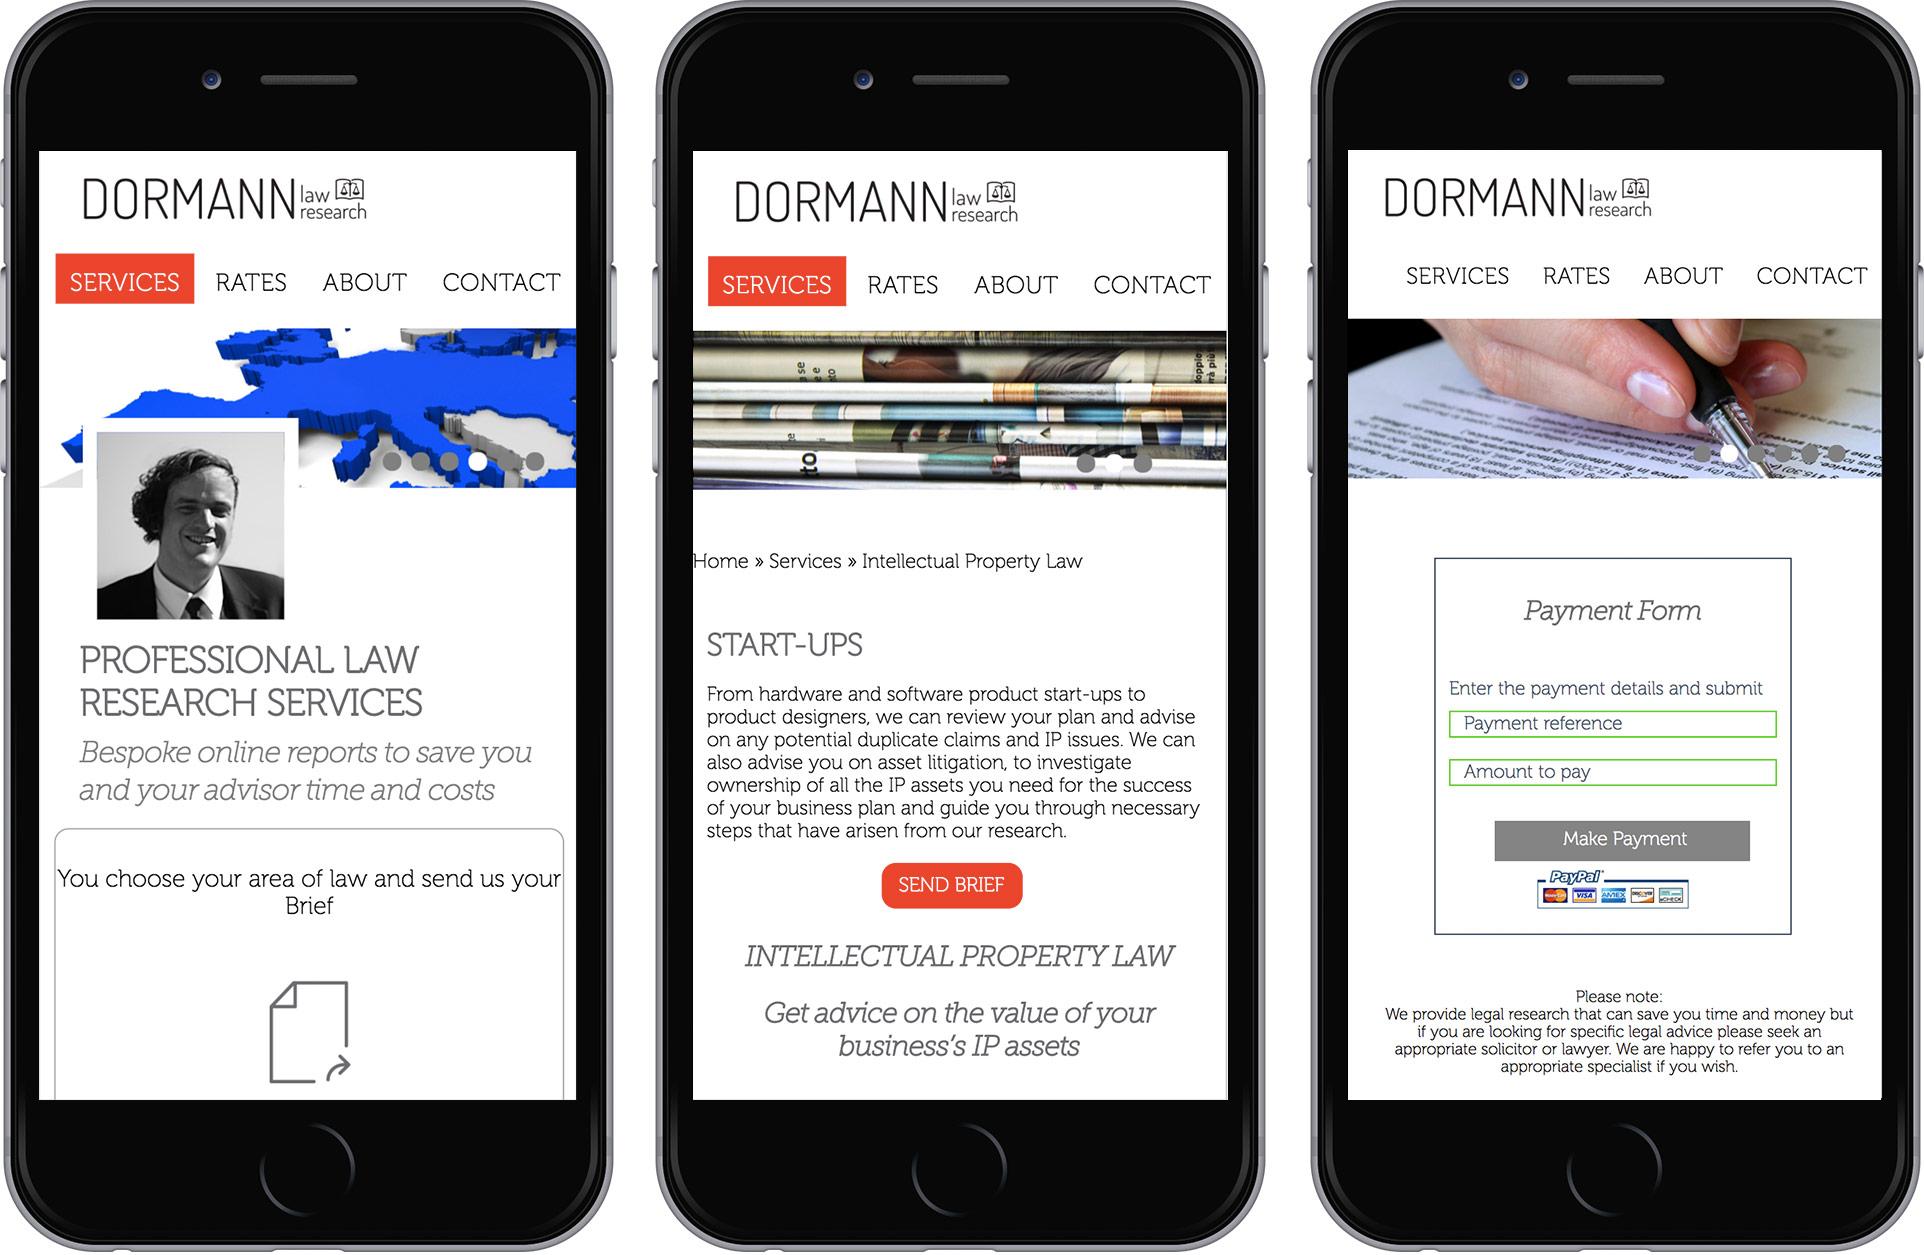 dormannlaw-mobile